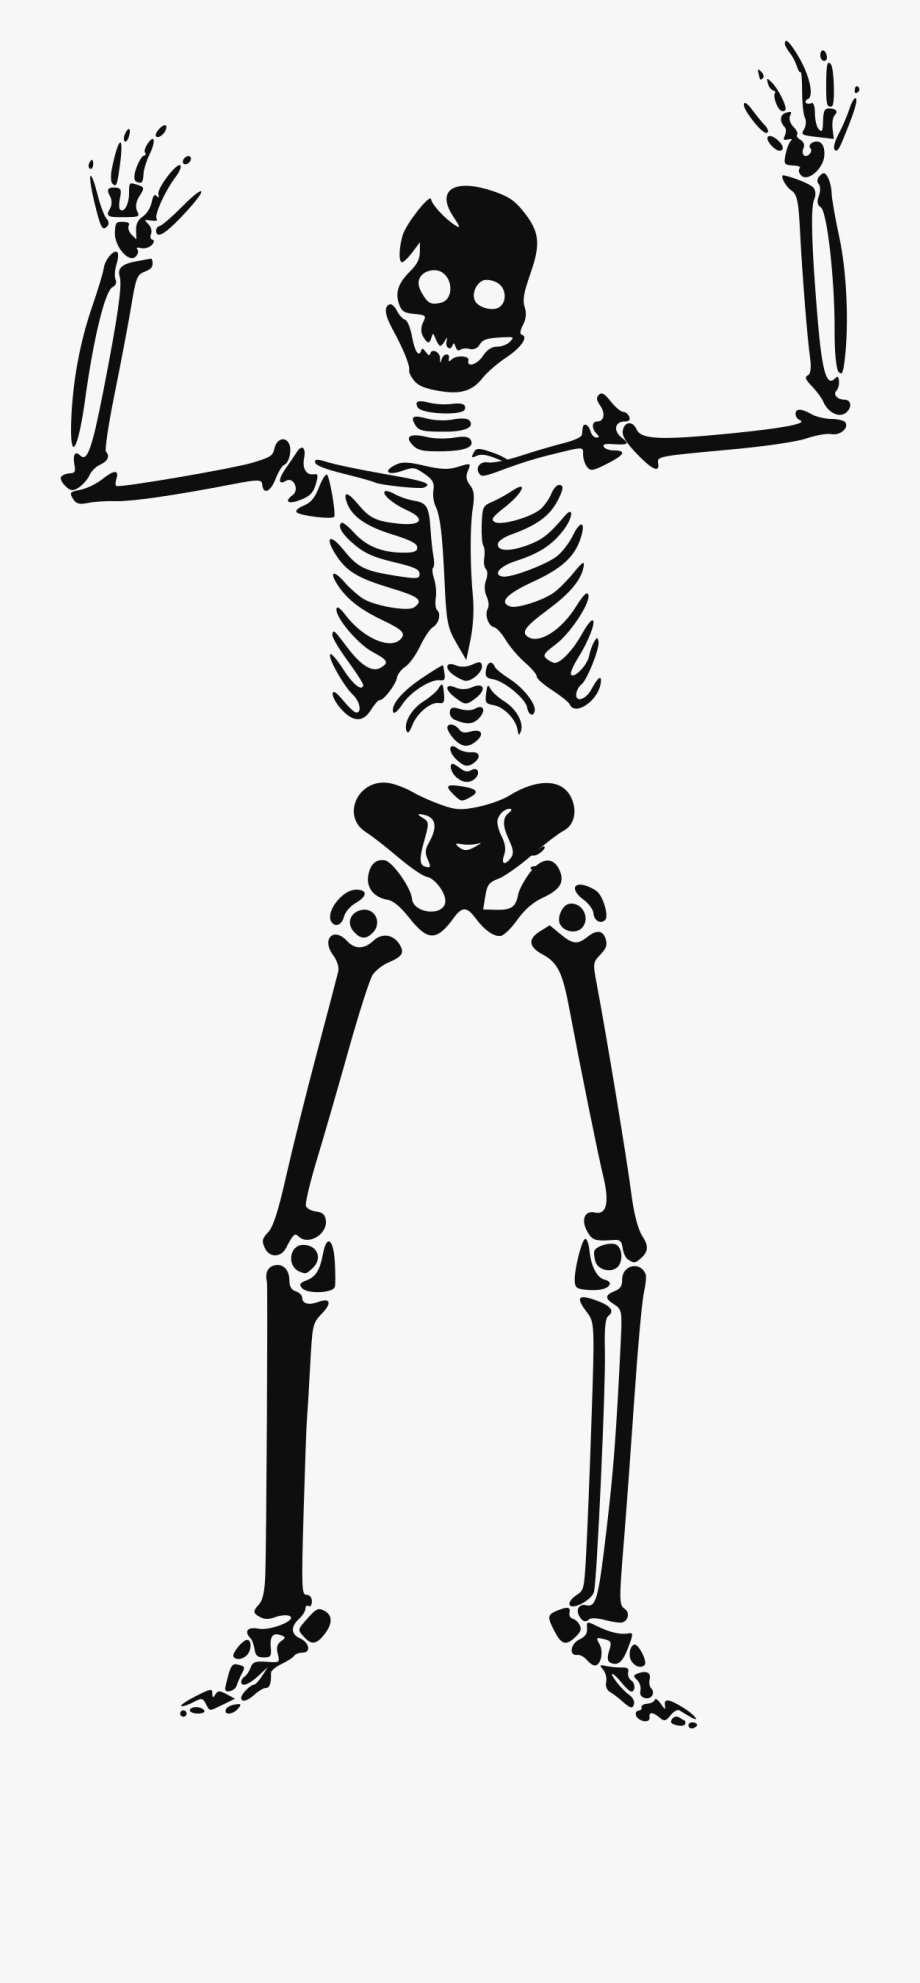 Halloween skeleton pictures clipart banner library library Skeleton Clipart Transparent - Halloween Skeleton Clipart ... banner library library